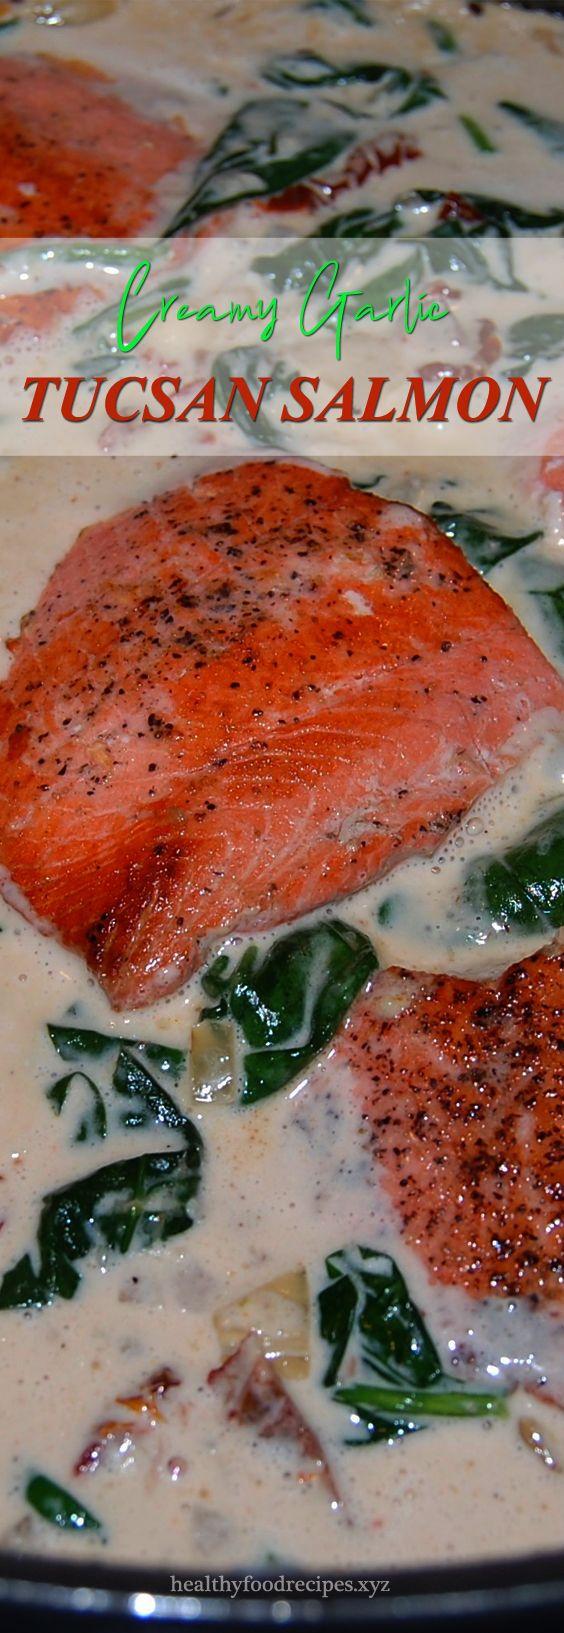 Photo of Easy Creamy Garlic Tuscan Salmon